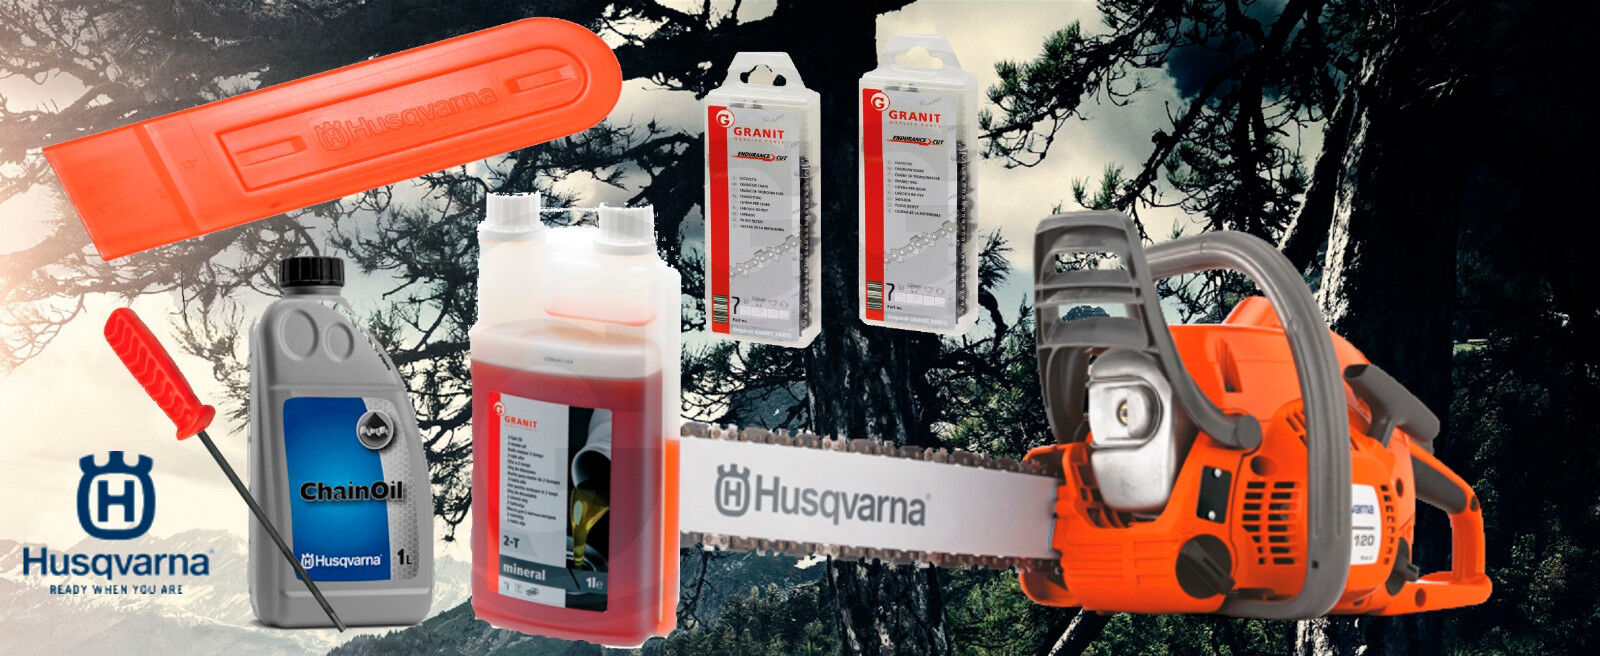 "Husqvarna 236 / 120 Mark II  Kettensäge/Motorsäge ""All in One"" aus 12/2018"